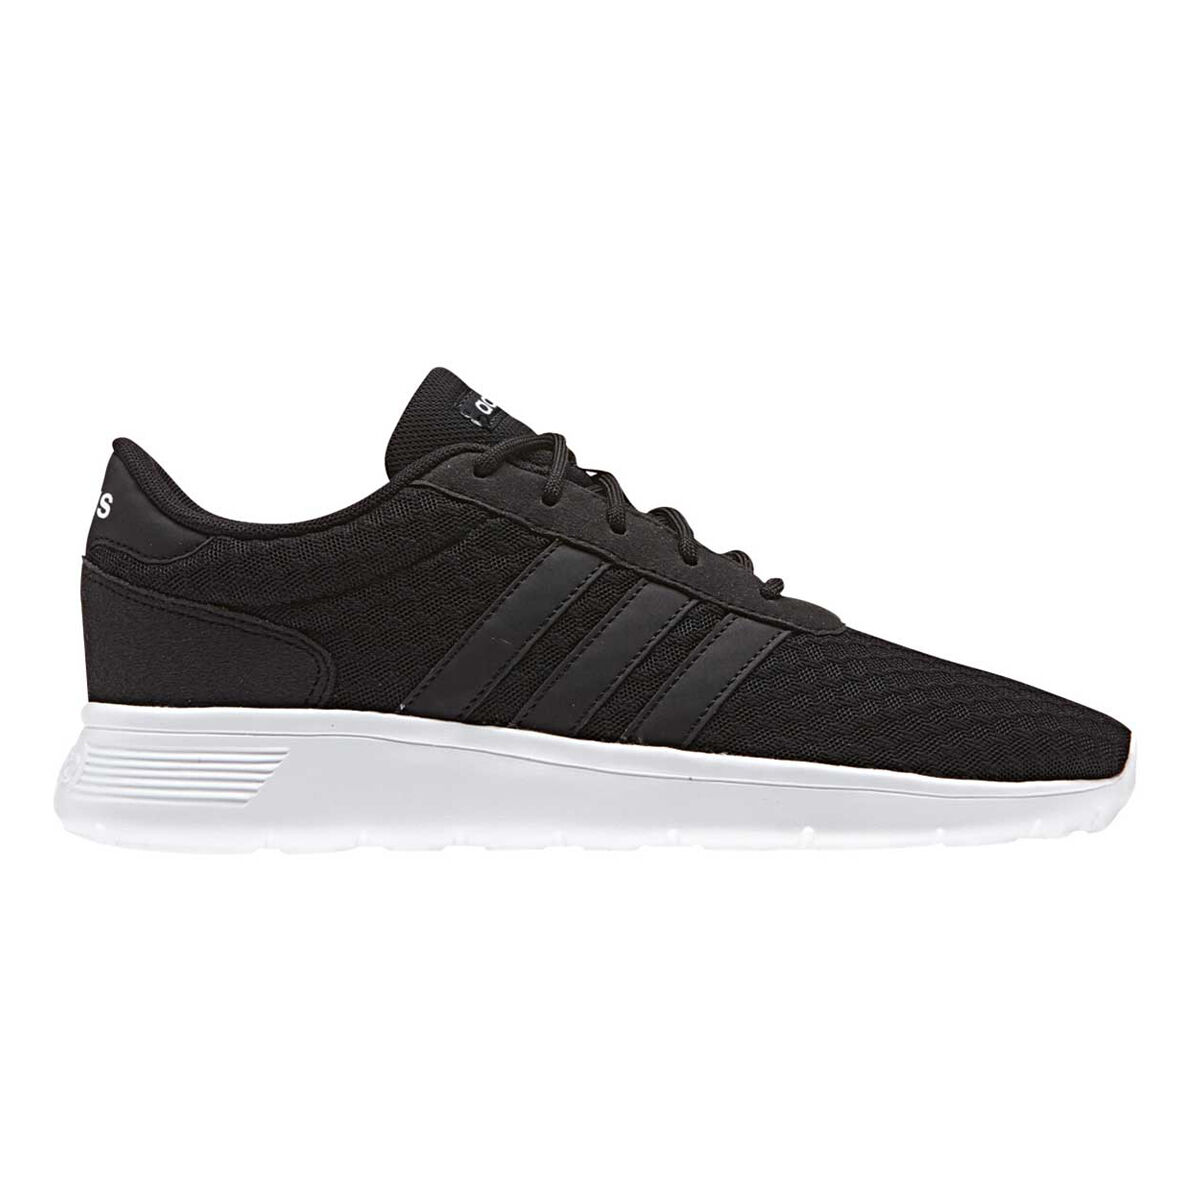 adidas Superstar BlackBlack EG4957 | Buy Online